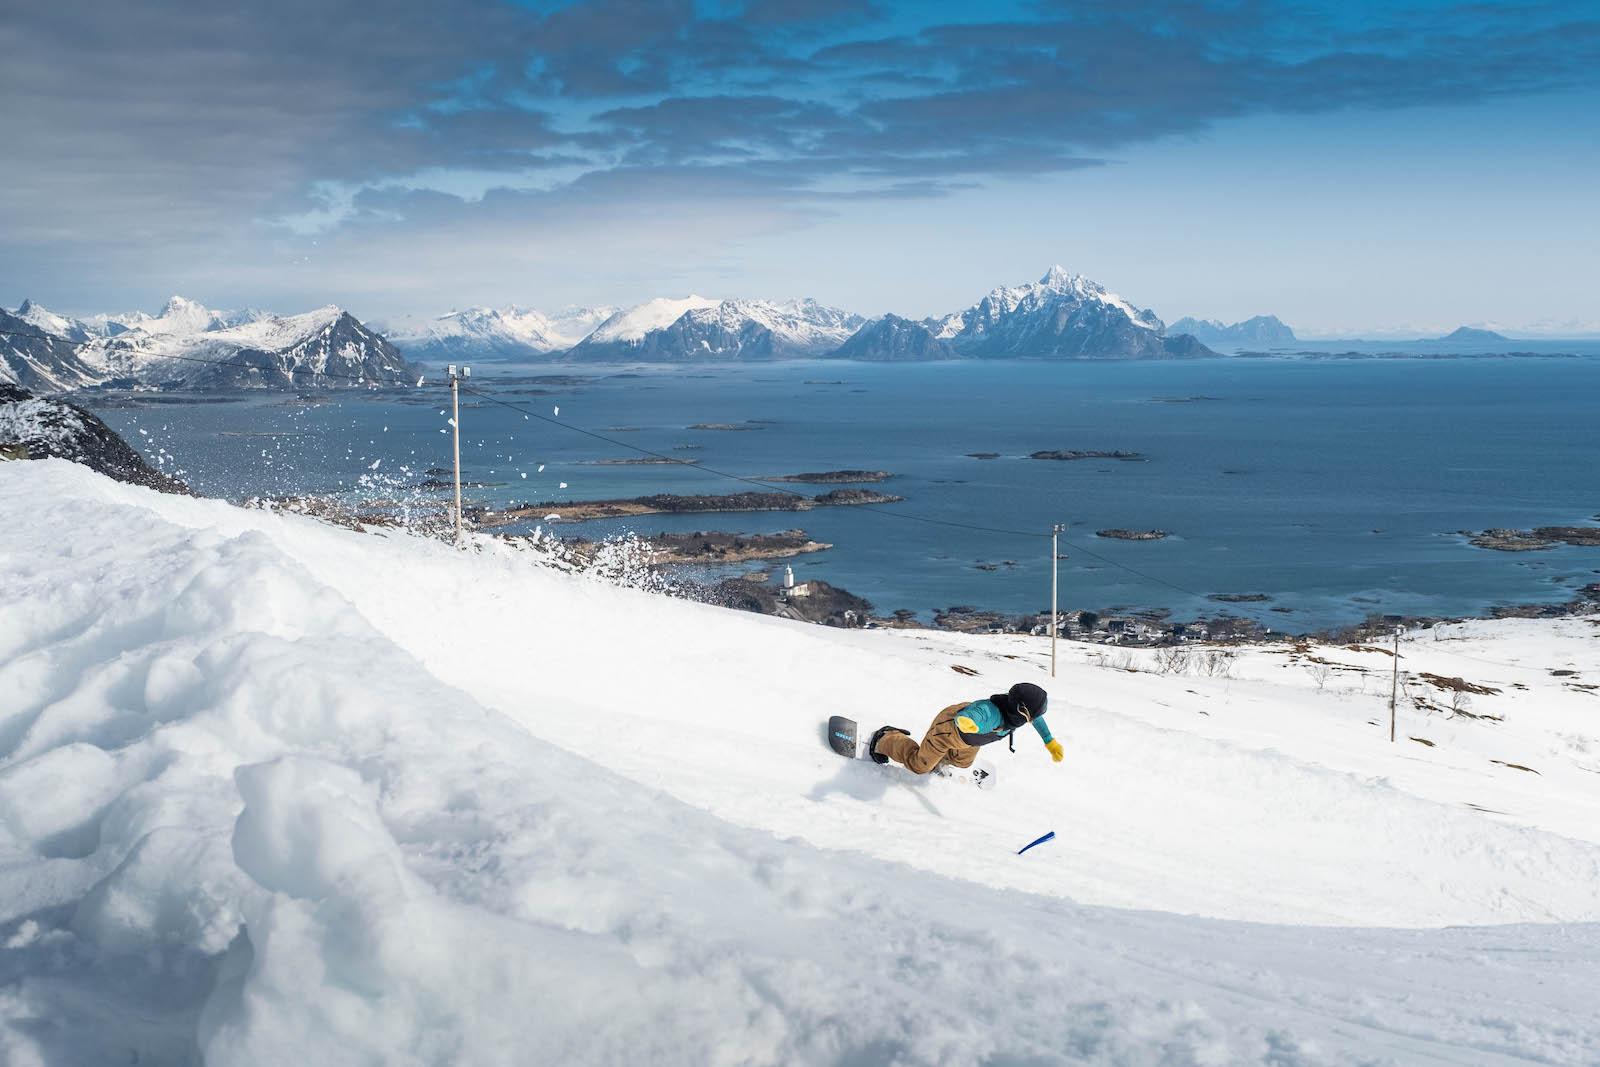 Lofoten Banked Slalom